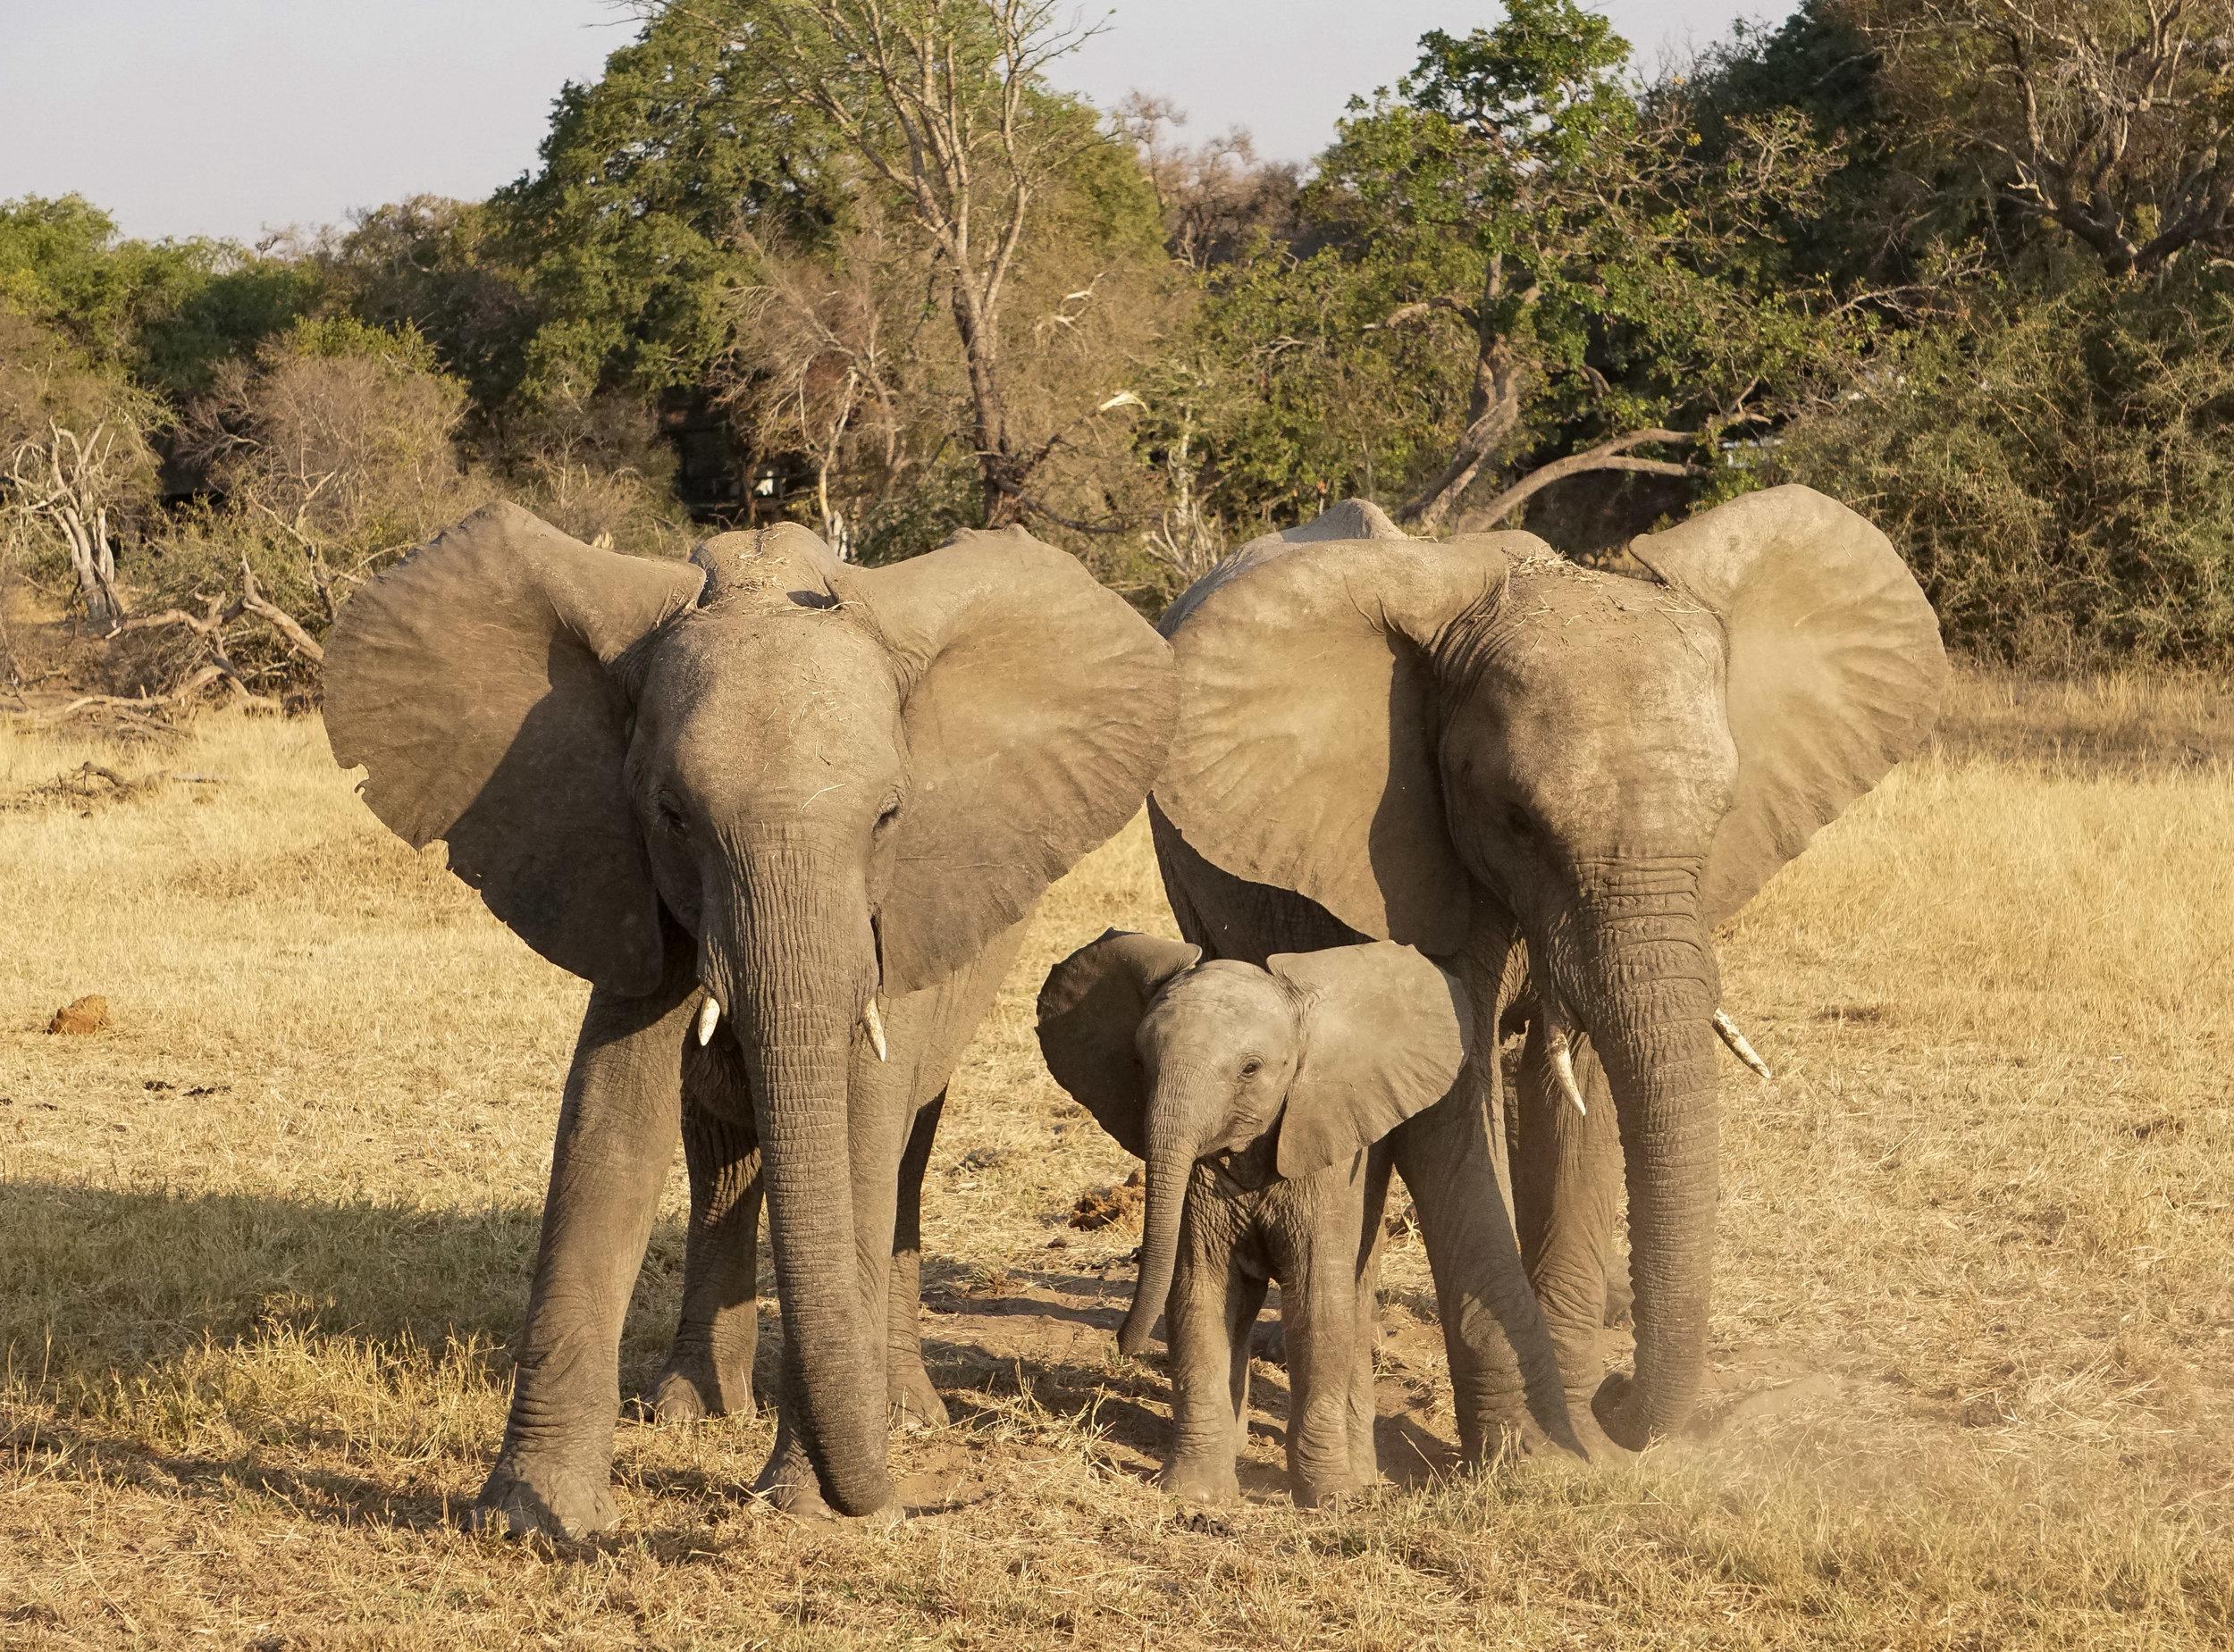 htk.photography.south.africa.safari.elephant.family.landscape.jpg